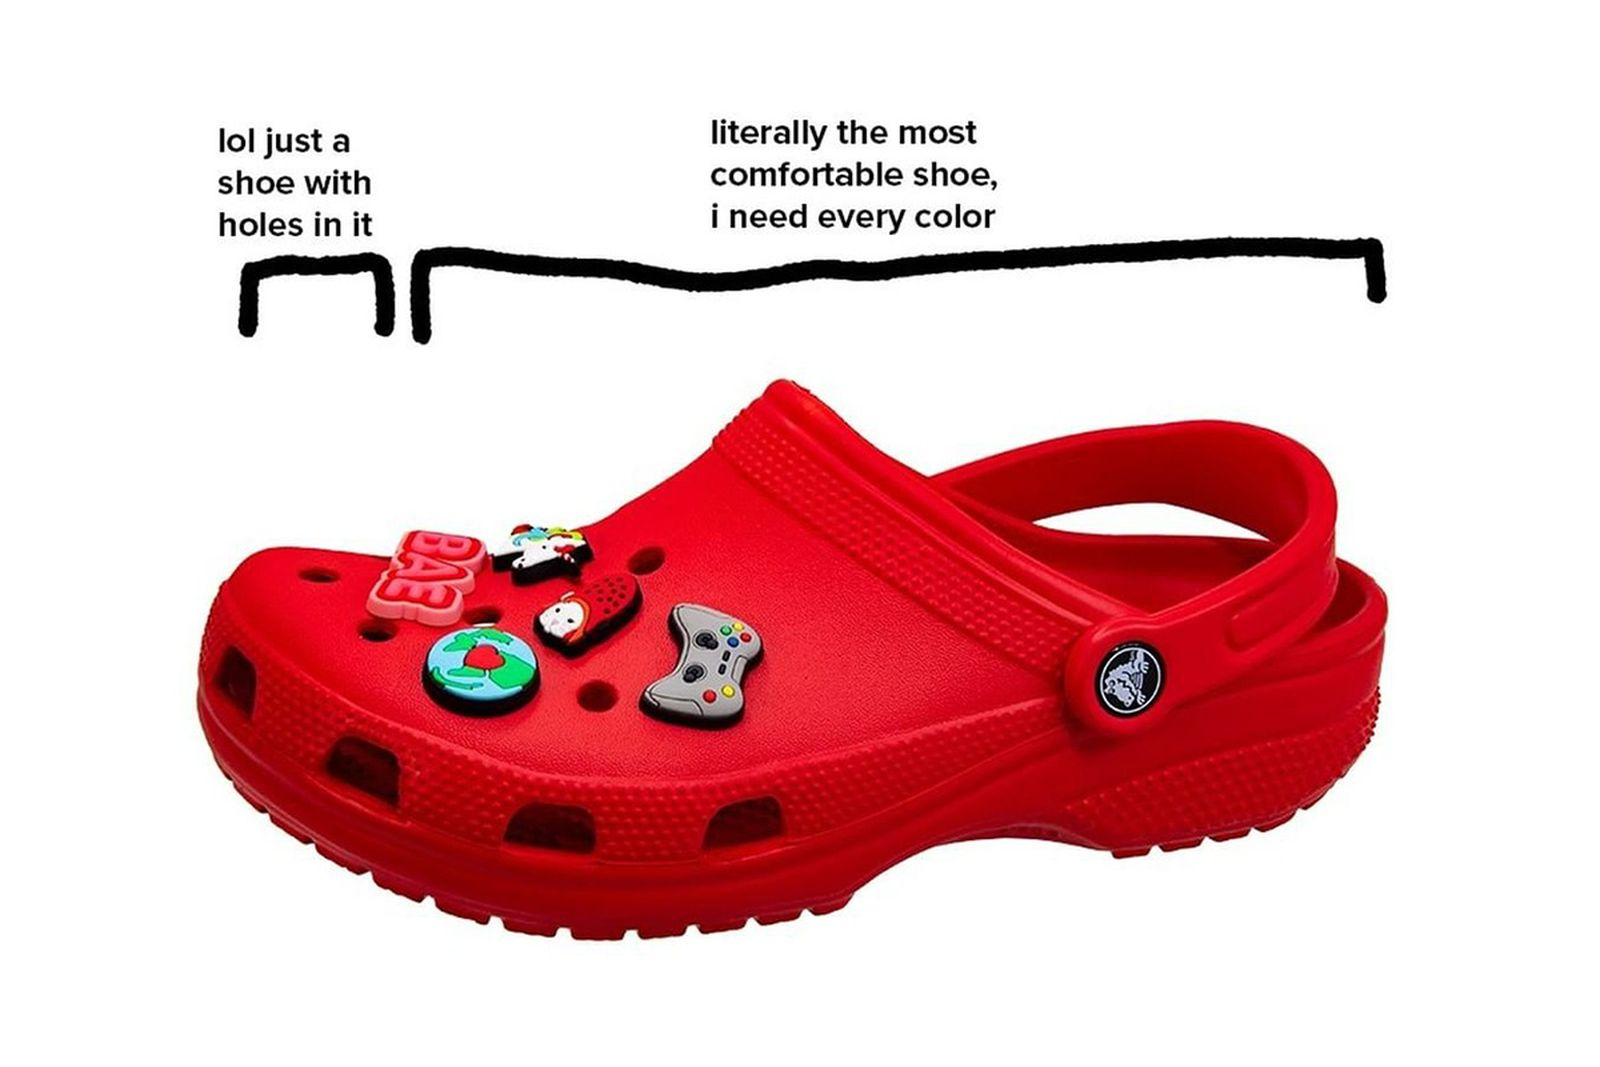 crocs-02